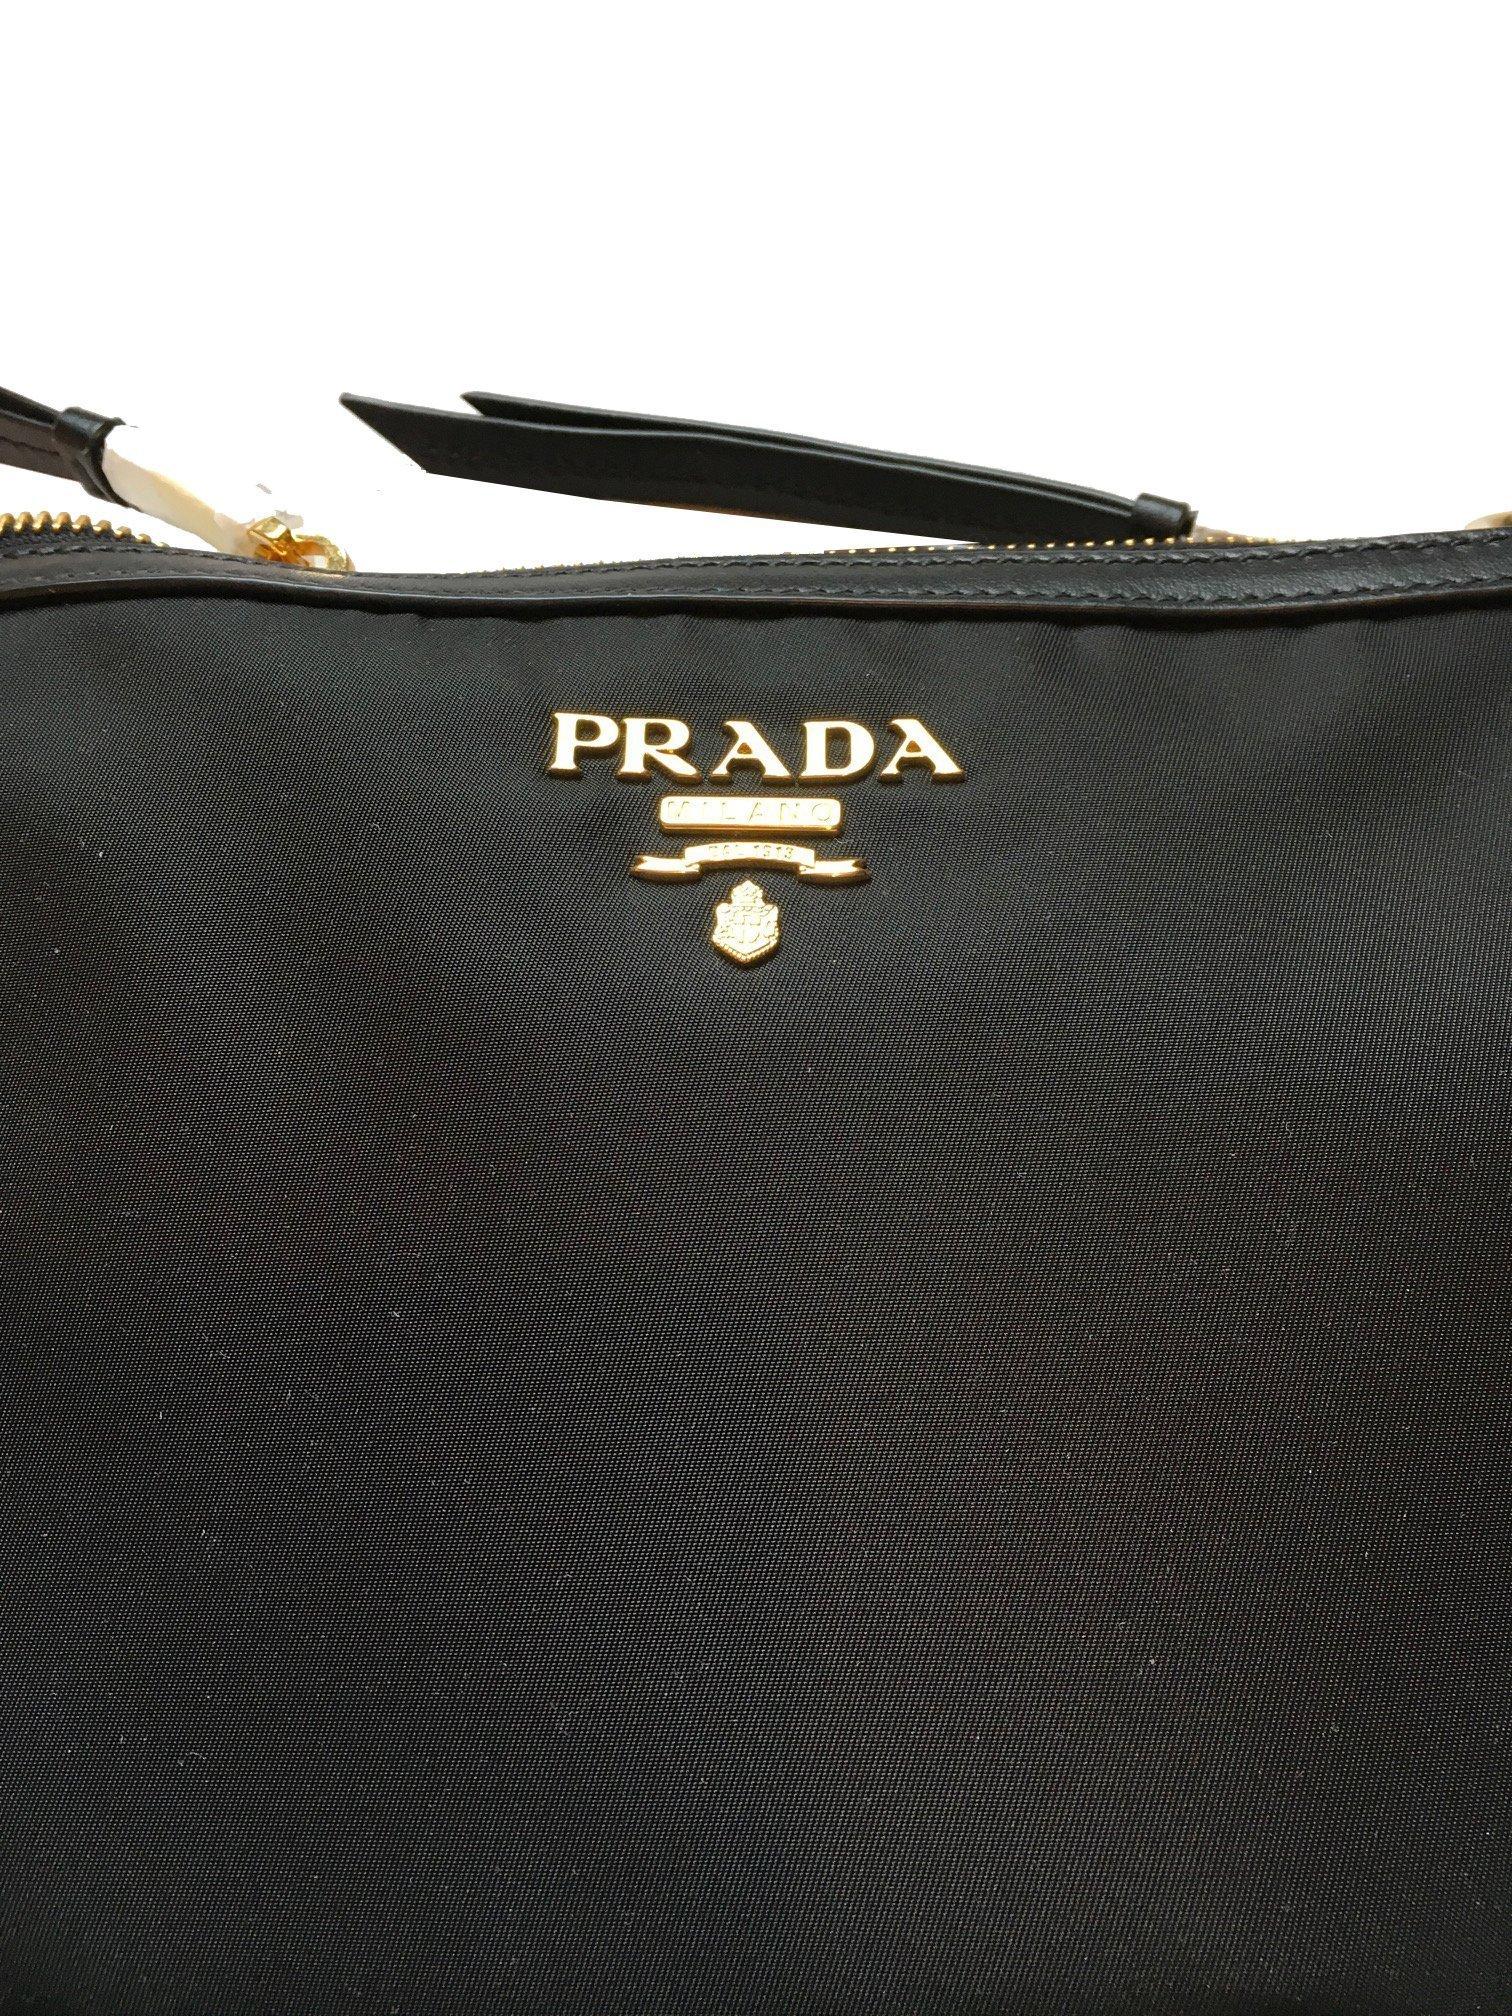 27fa52194eff Prada Women's Over The Shoulder Handbag 1bh046 Black Nylon Cross Body Bag